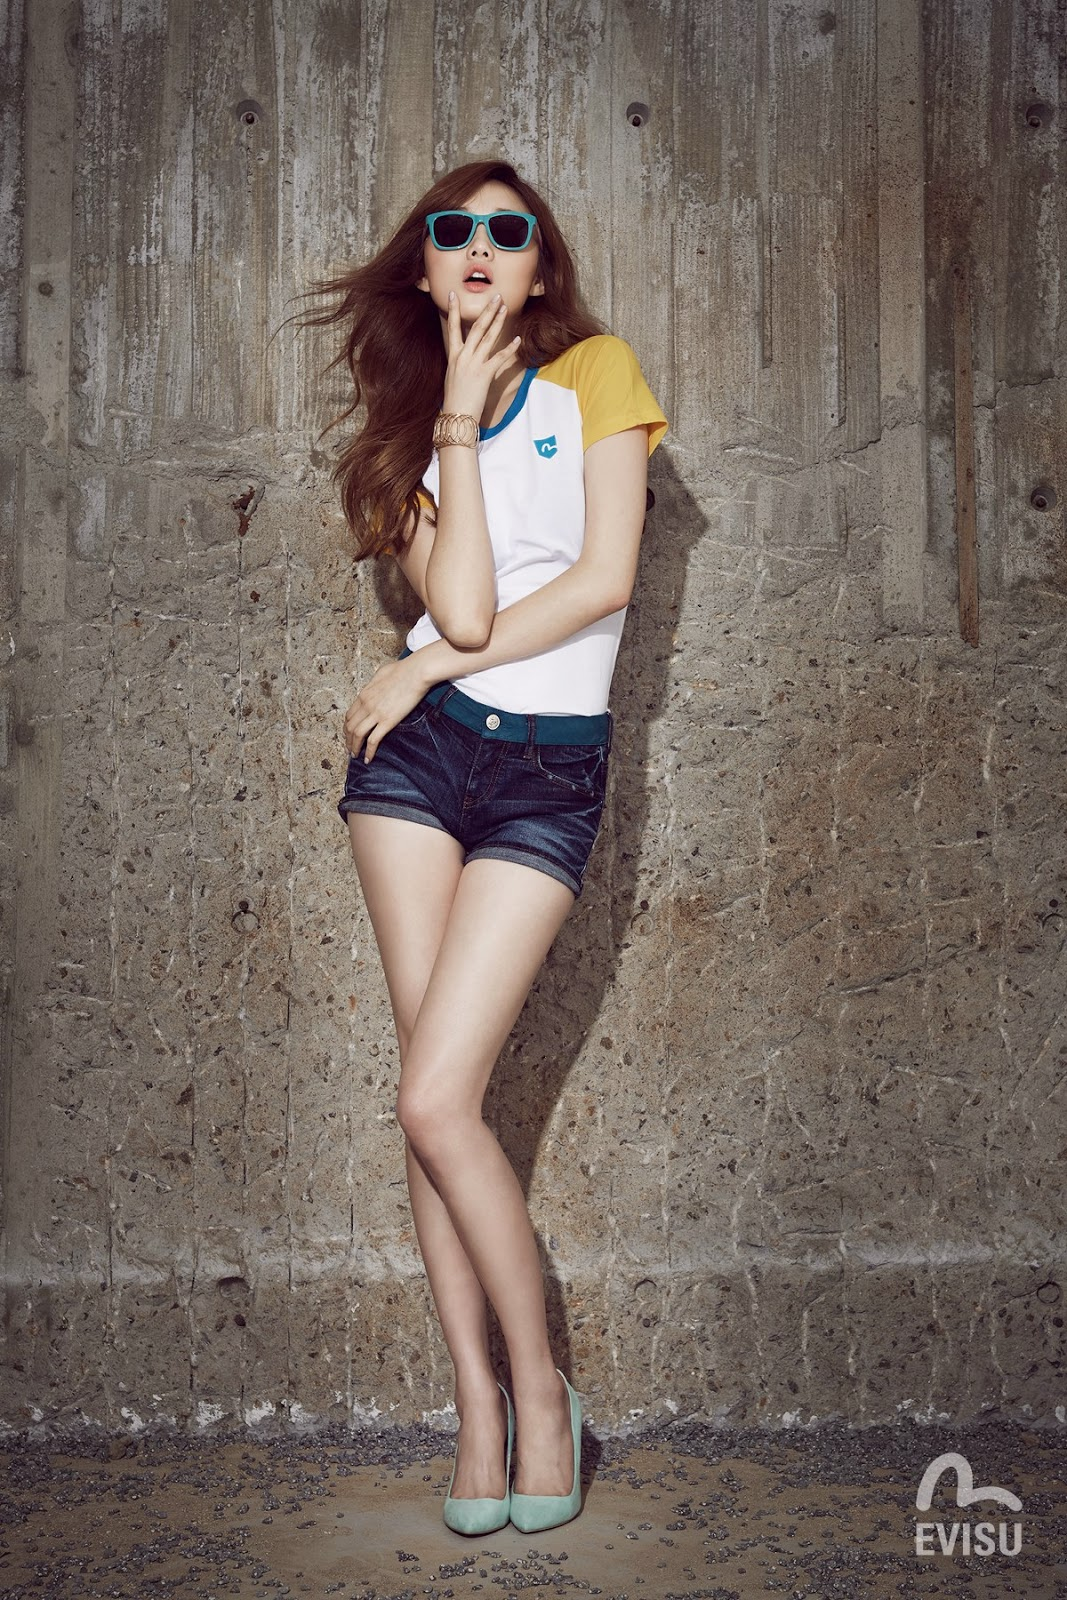 Lee Sung Kyung - Evisu Spring/Summer 2014